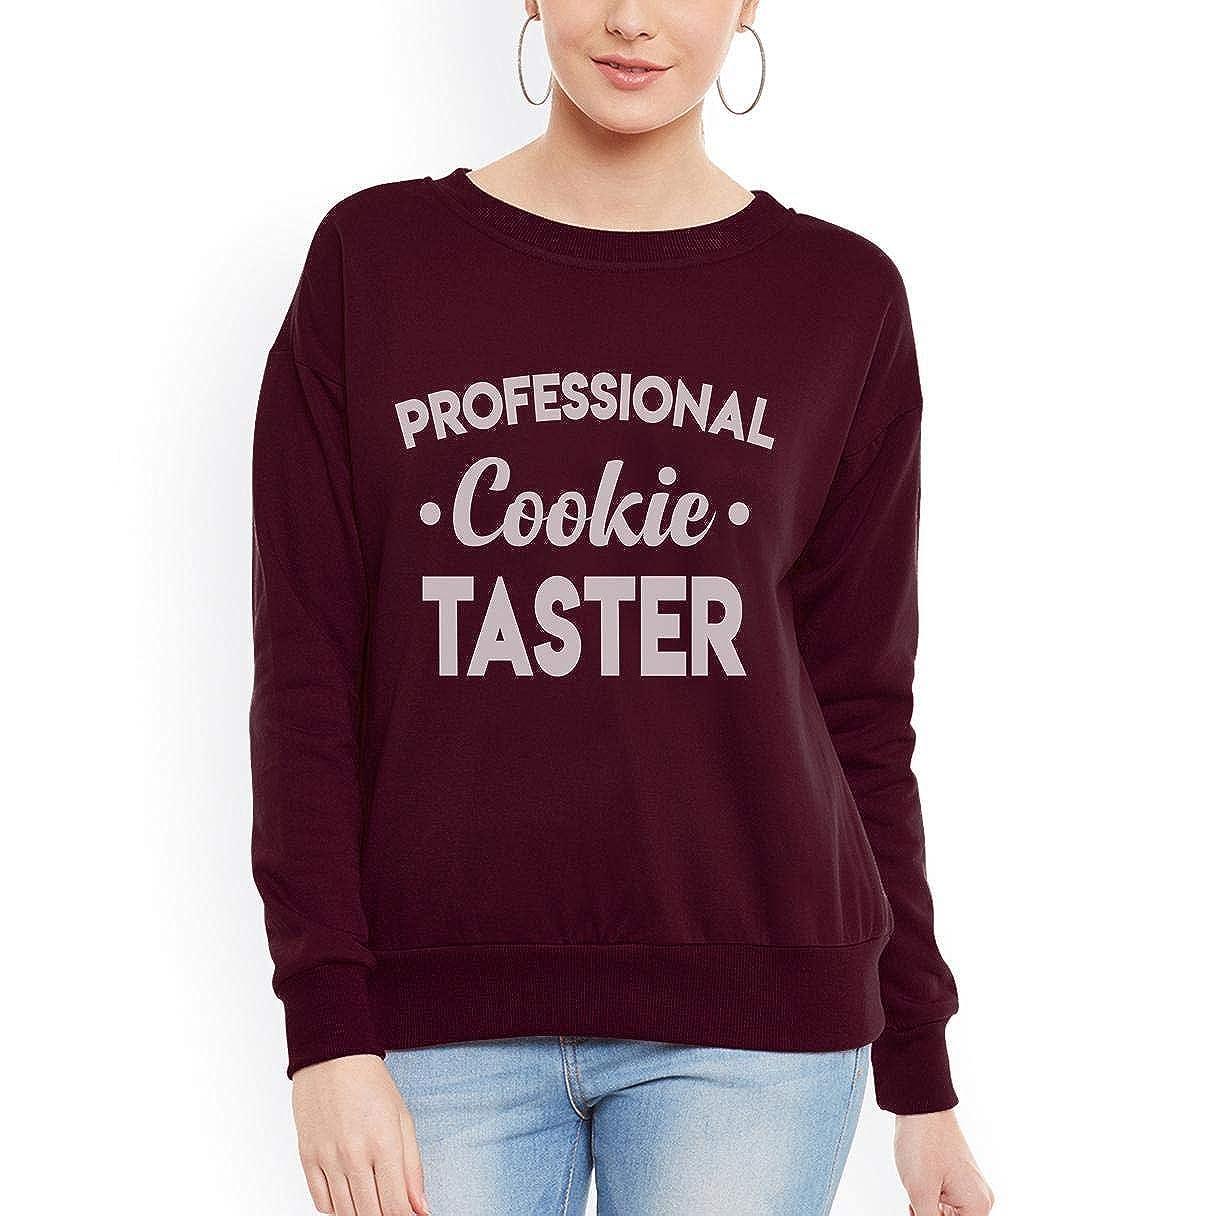 Doryti Professional Cookie Taster Baking Women Sweatshirt tee